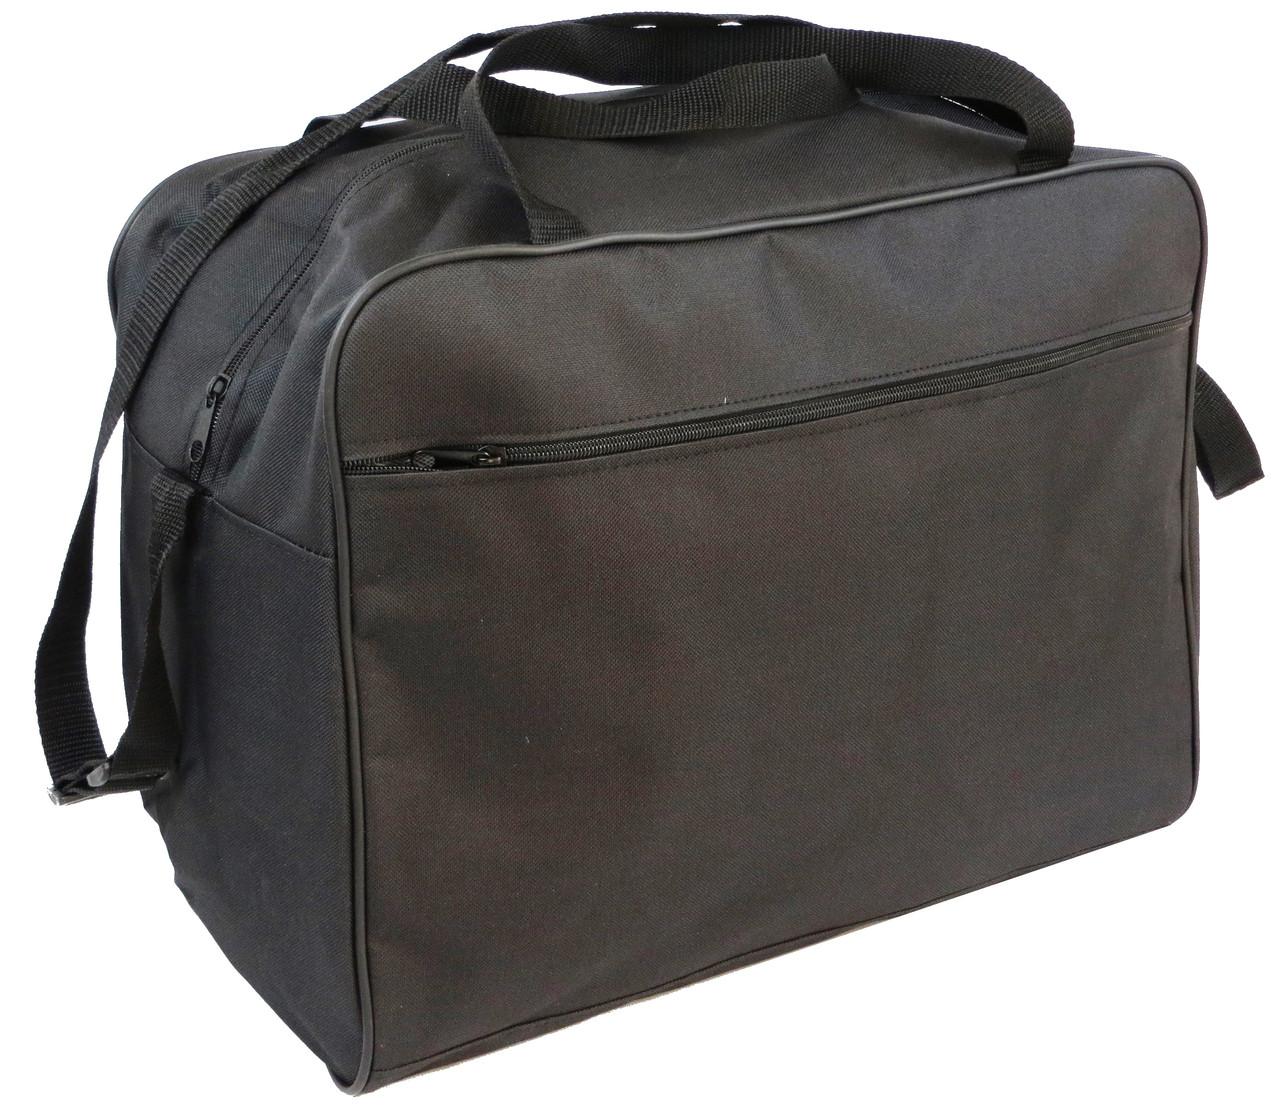 Дорожная сумка ручная кладь Wizzair WT Loren 29 L